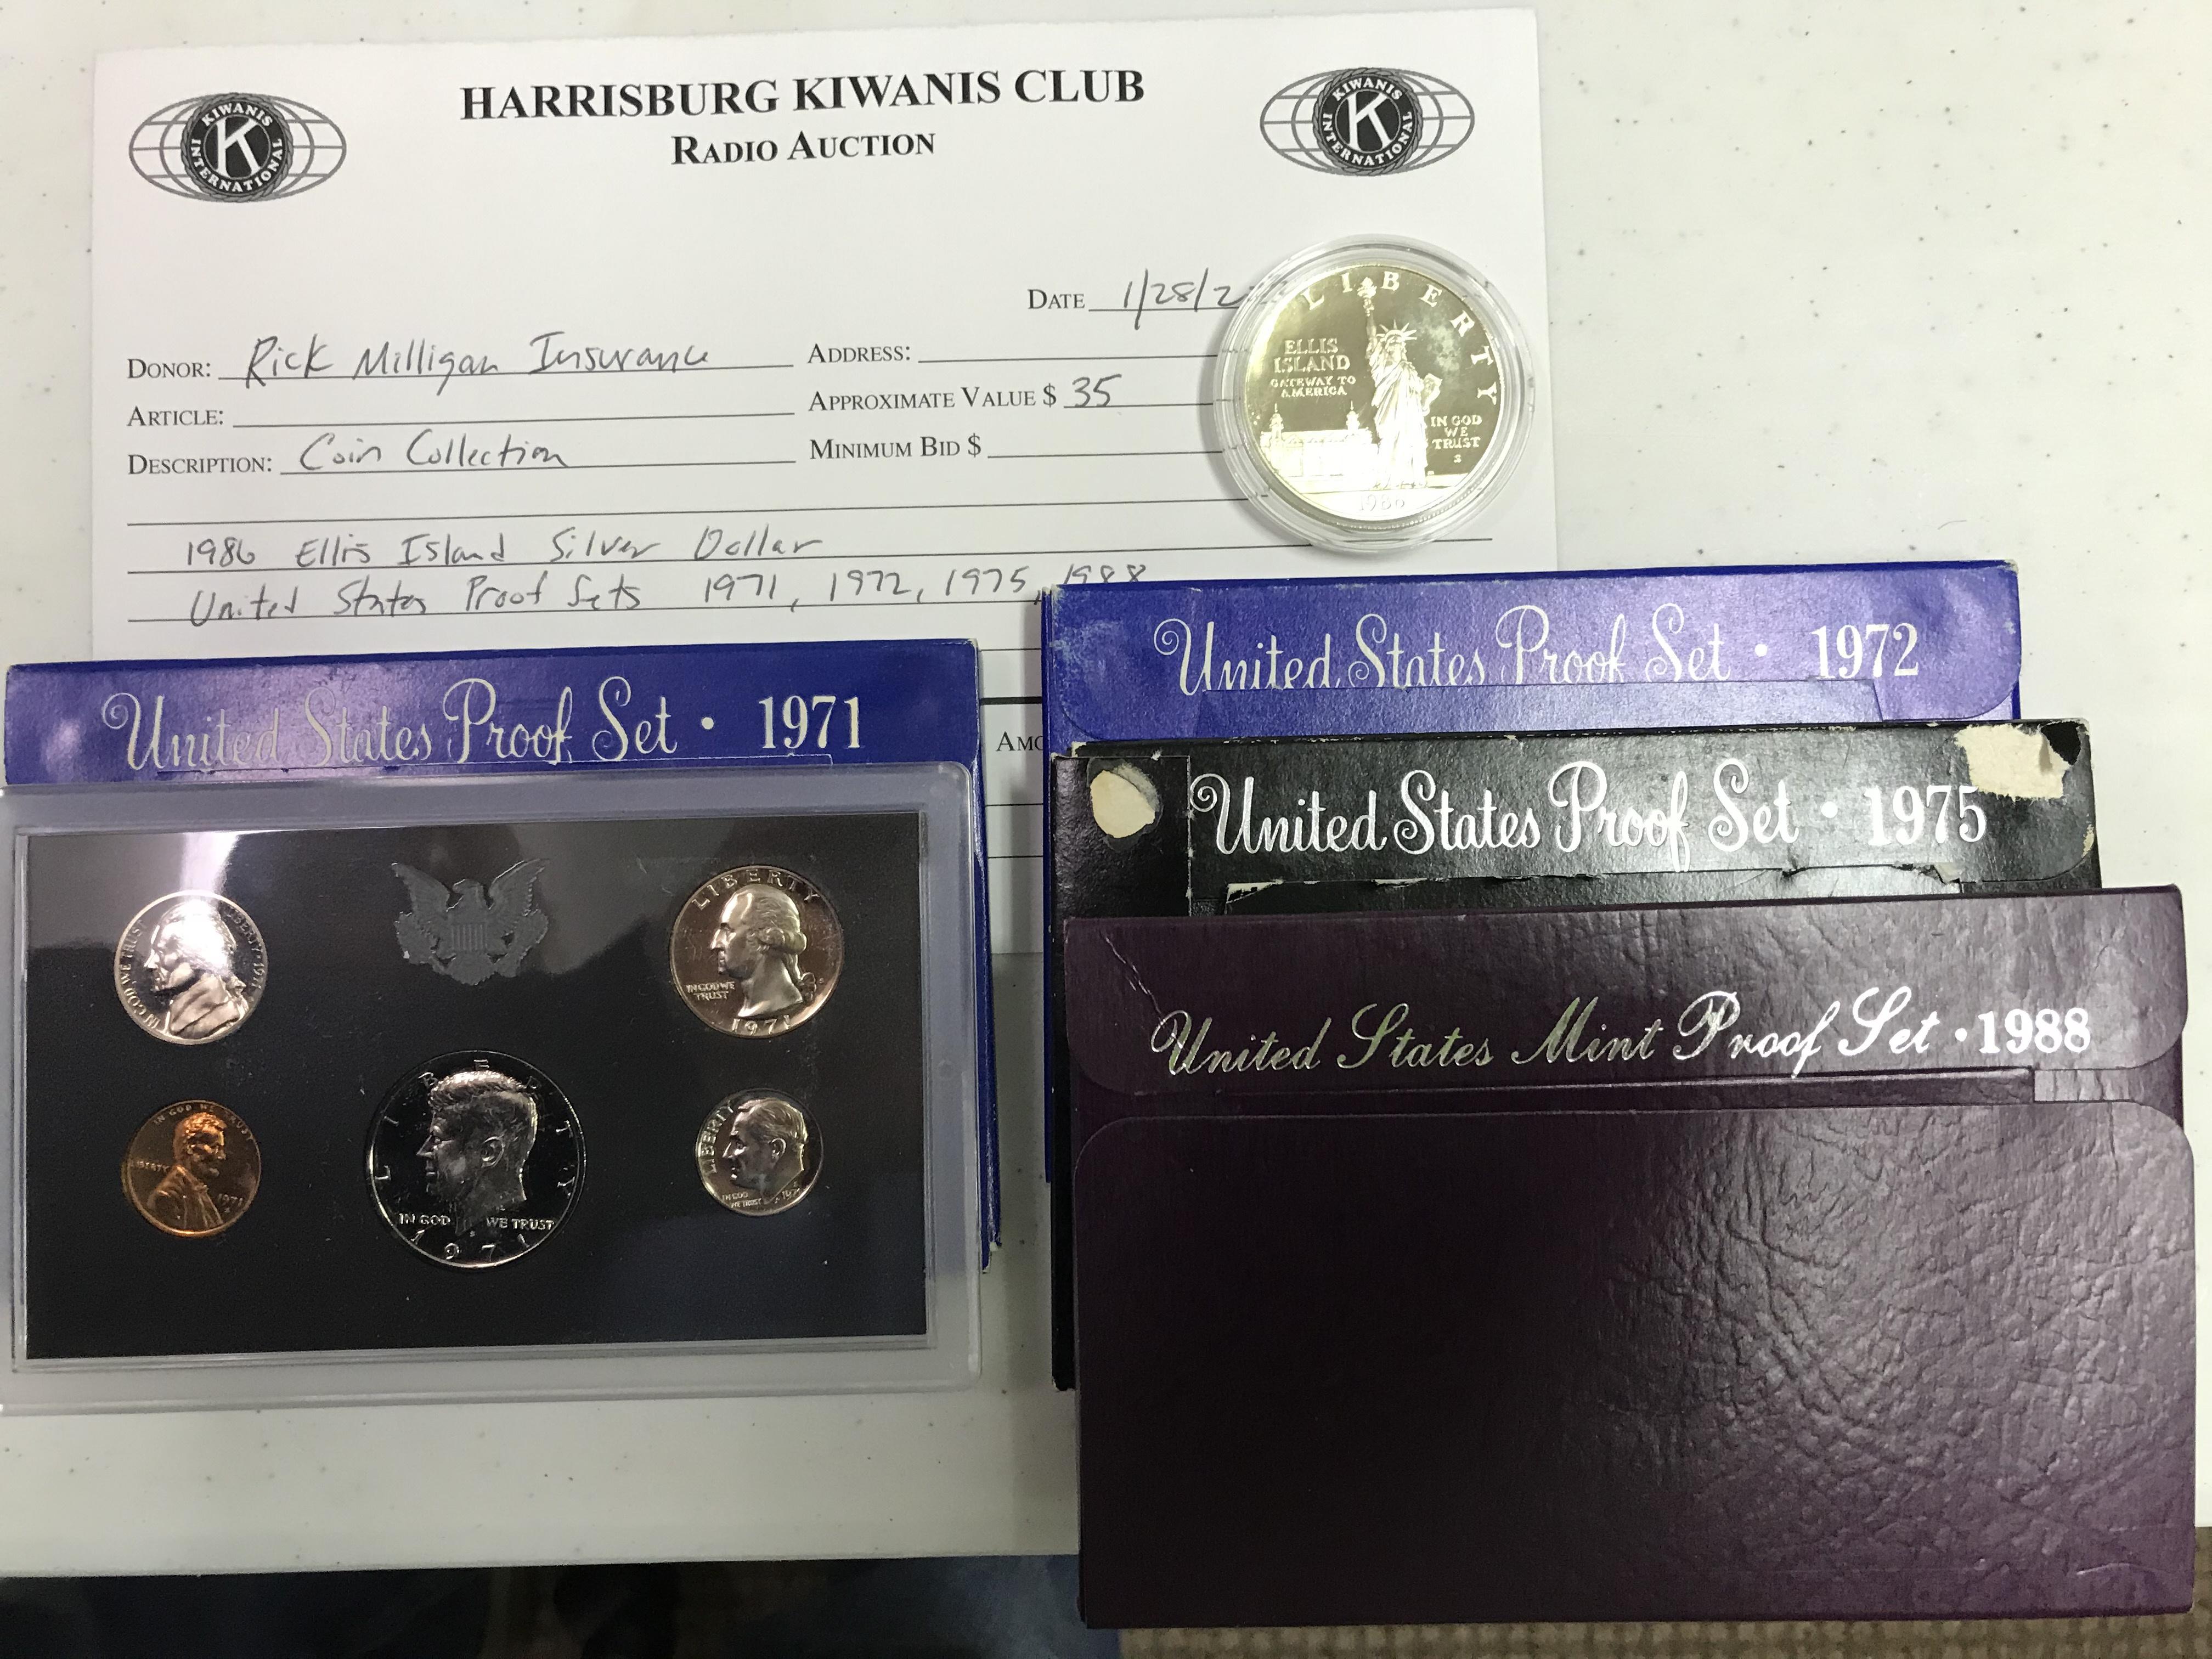 Item 128 - Rick Milligan Insurance 1986 Ellis Island Silver Dollar & US Mint Proof Sets 1971, 1972, 1975, 1988